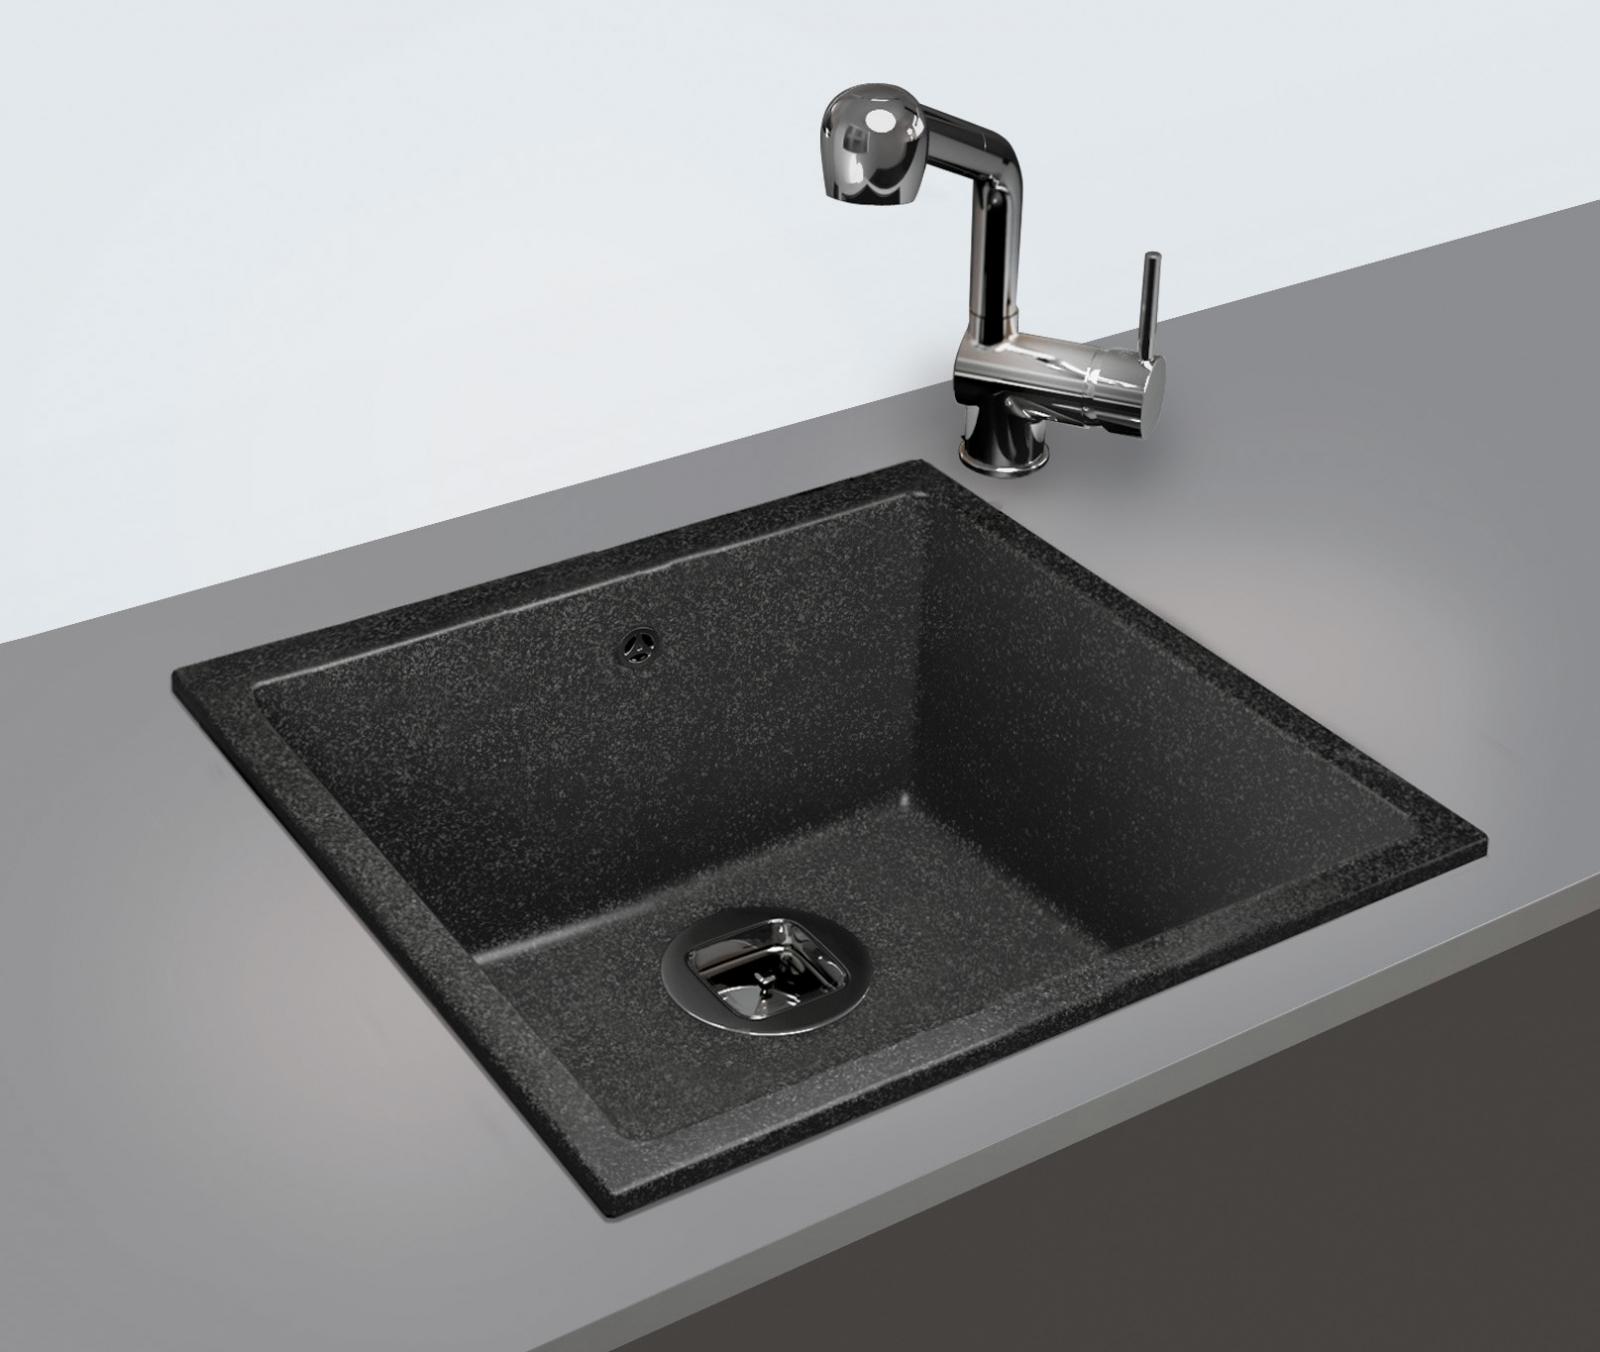 Мойка Tolero-R-128-001, цвет – серый металлик